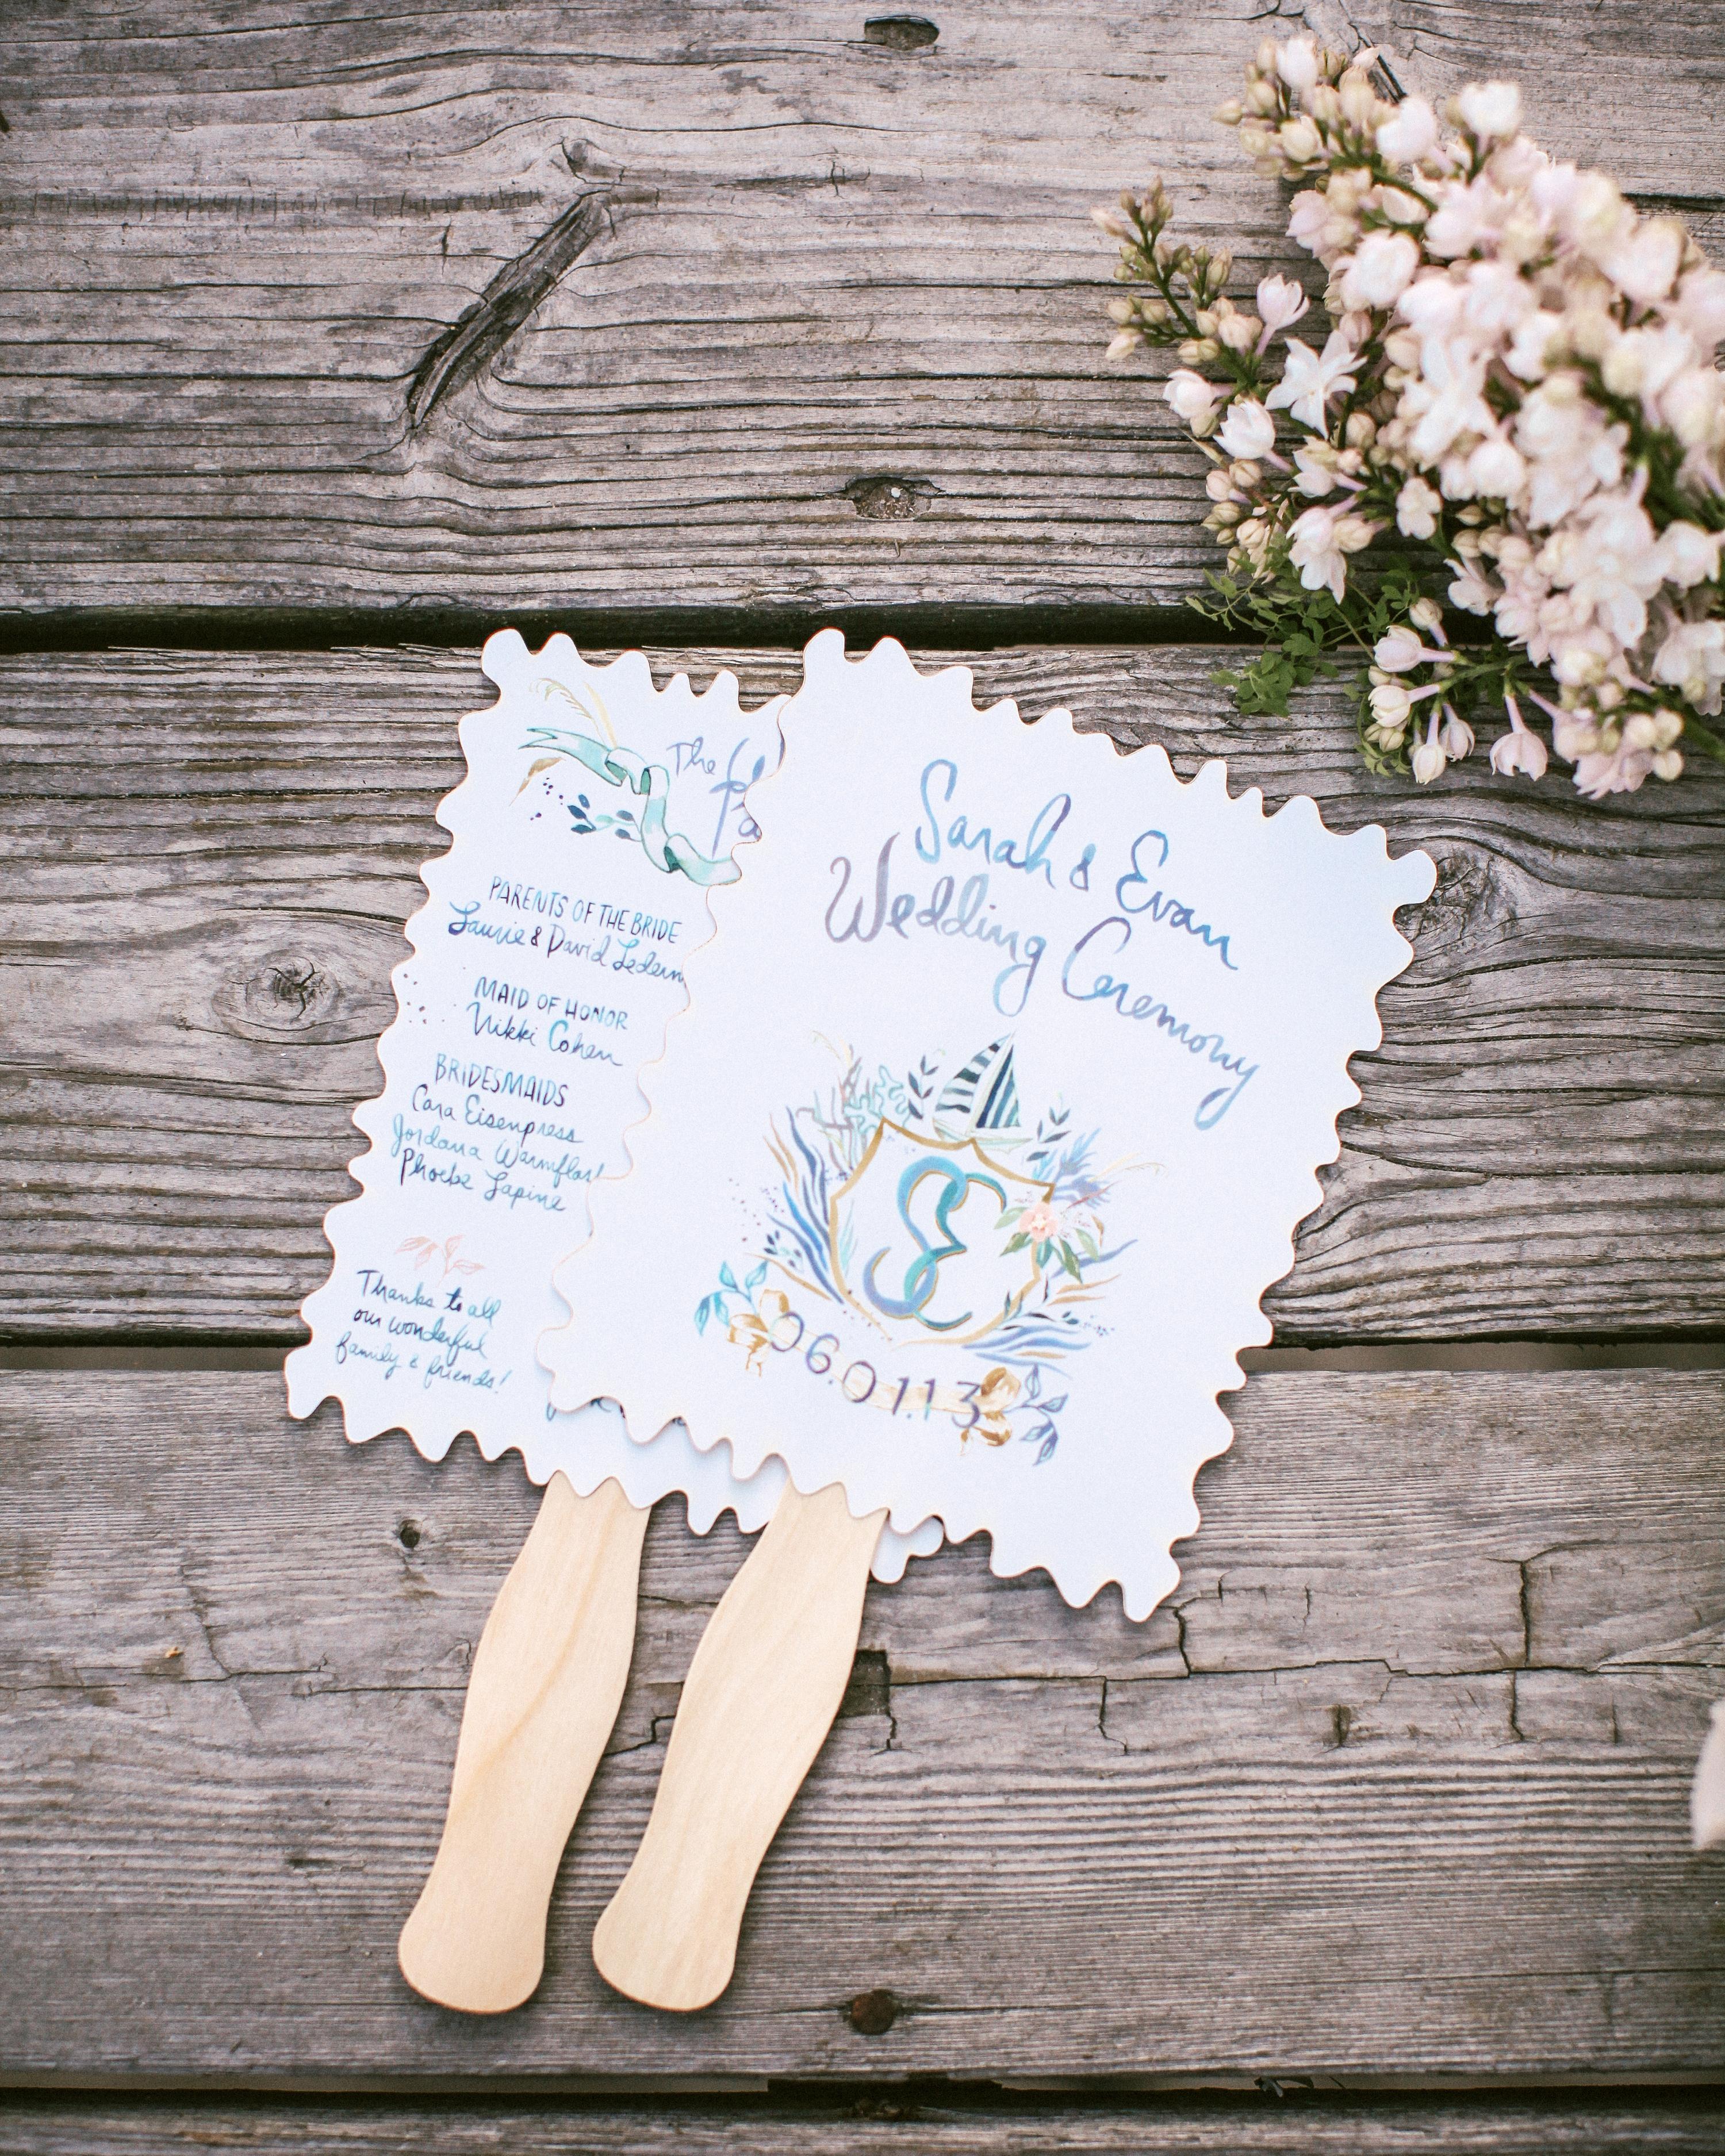 sarah-evan-wedding-program-0514.jpg